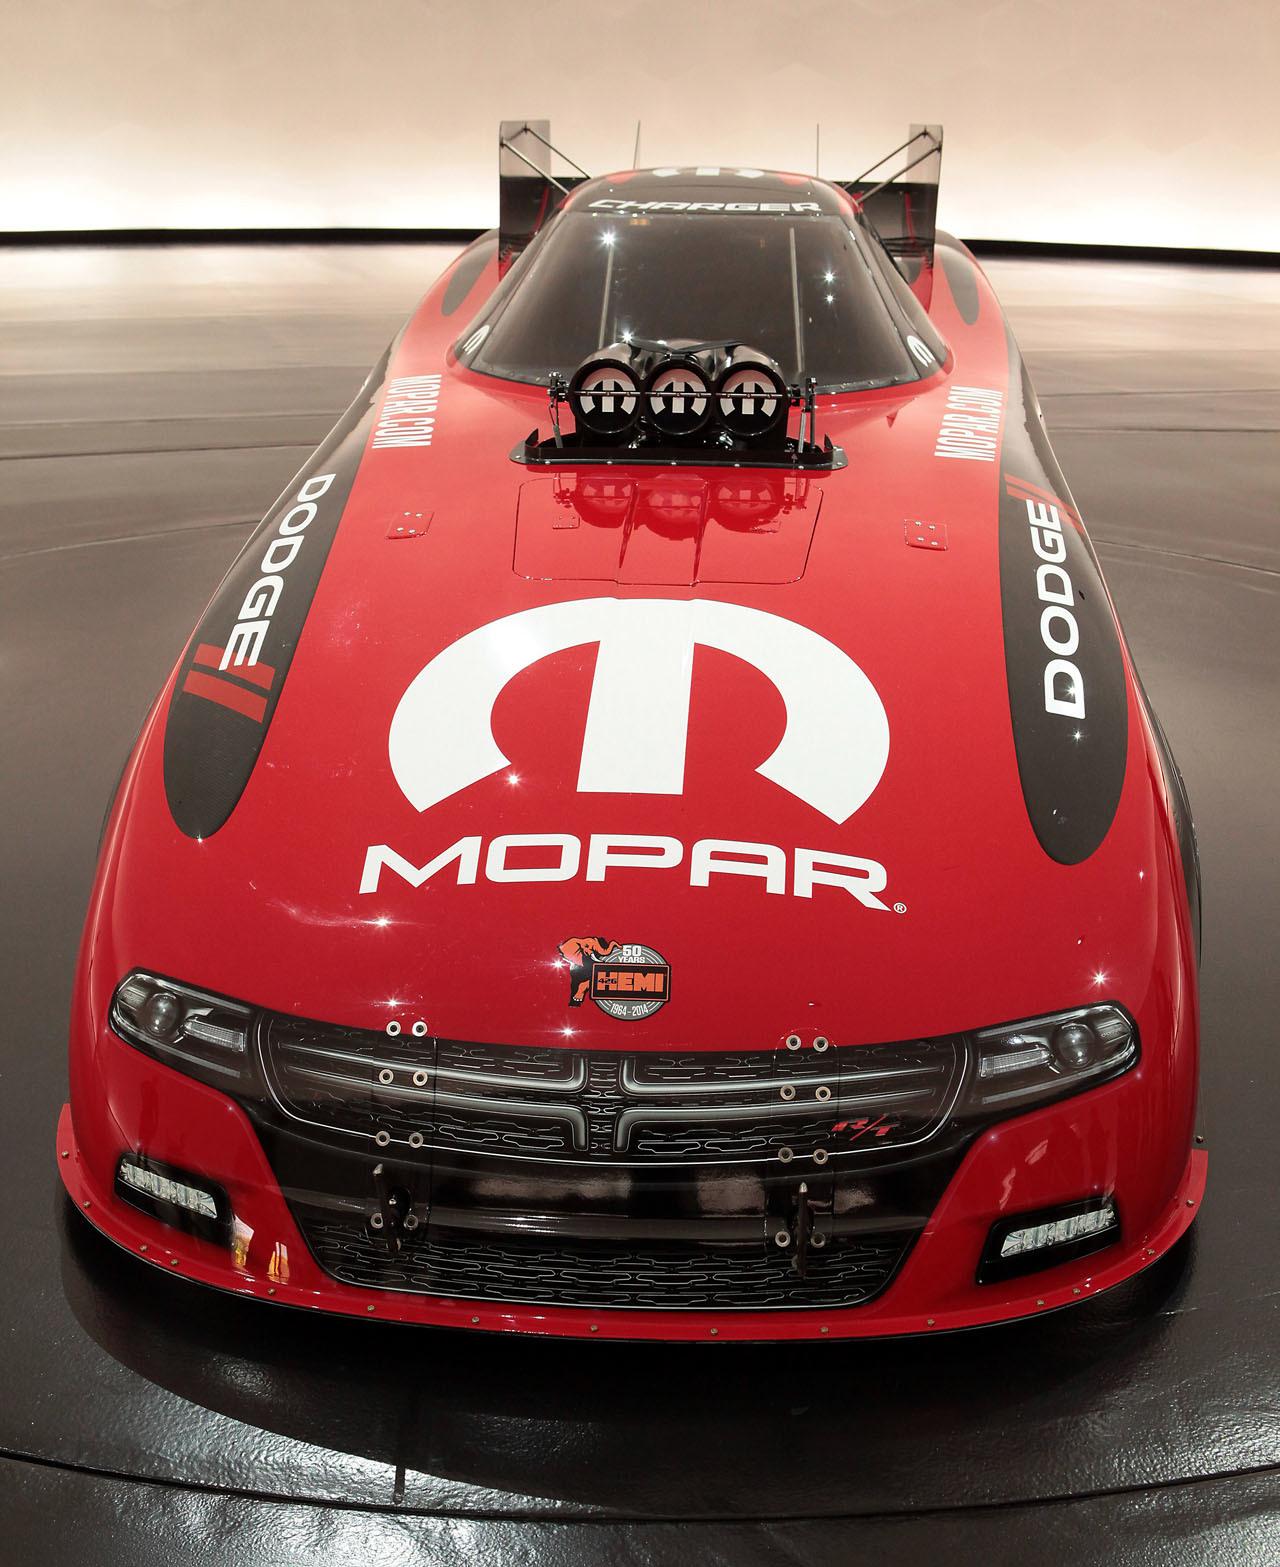 2015 Mopar Dodge Charger R/T NHRA Funny Car Unveiled At